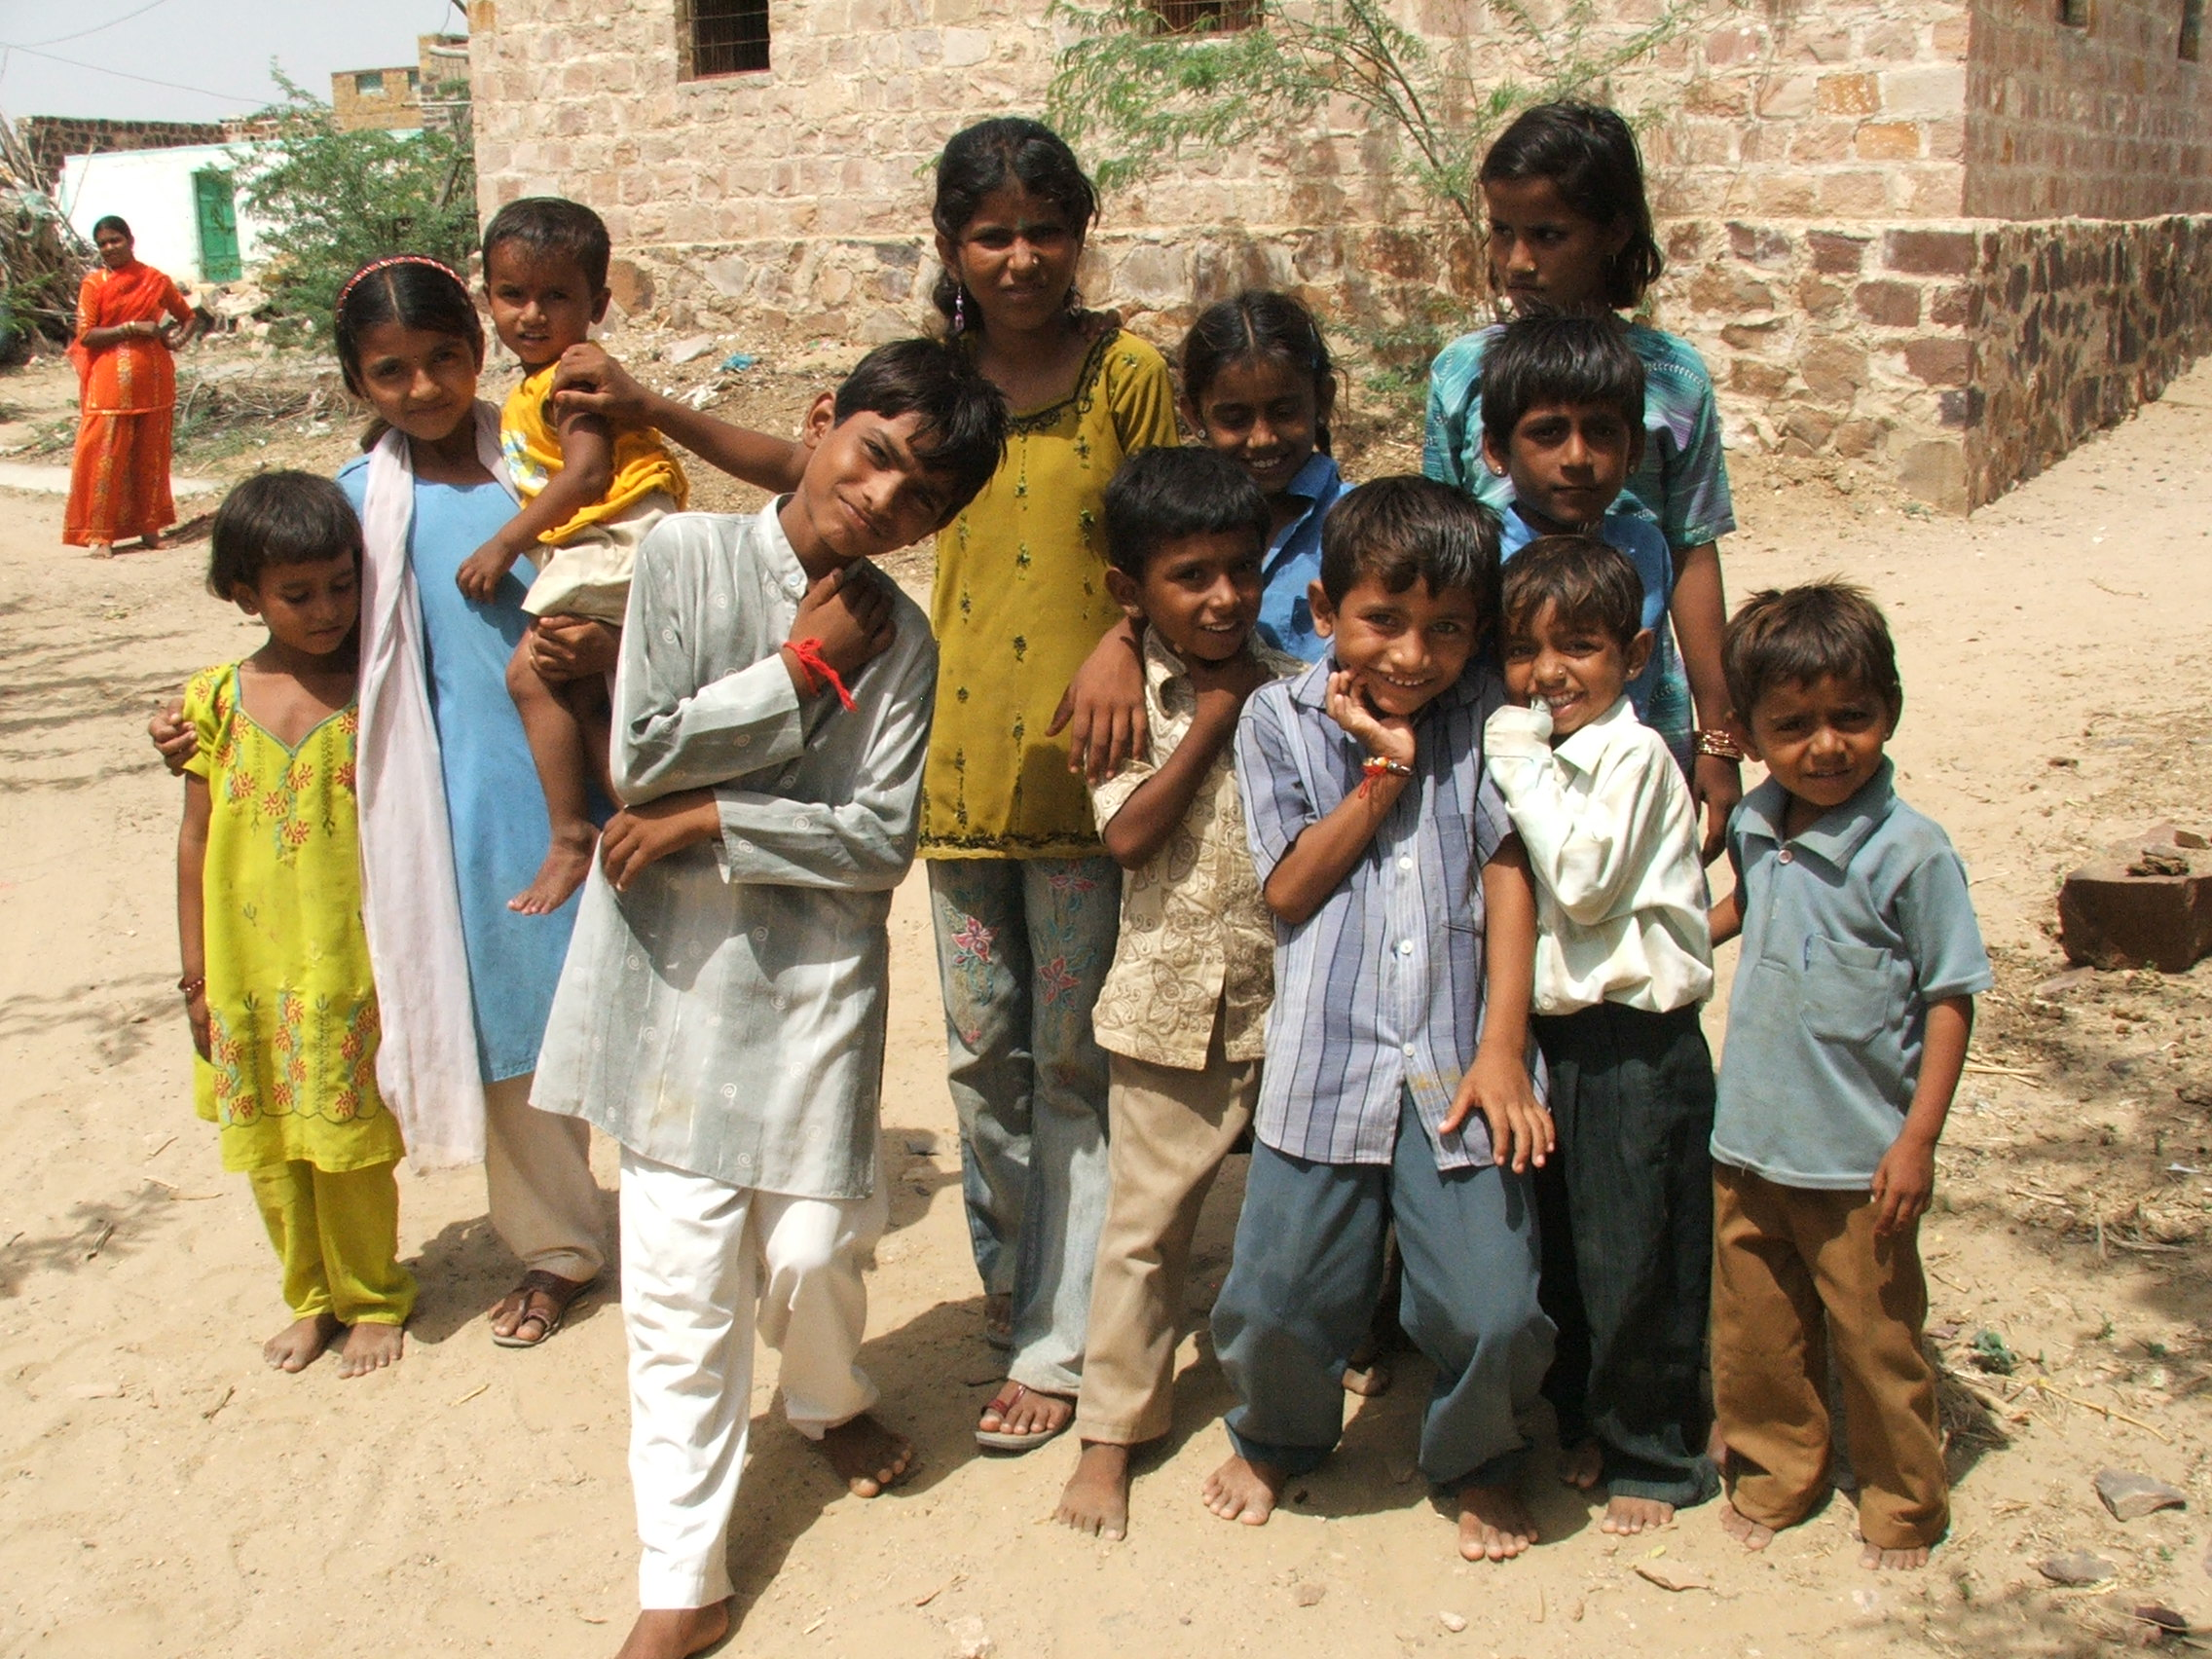 DSCF1147 bande d'enfants.JPG